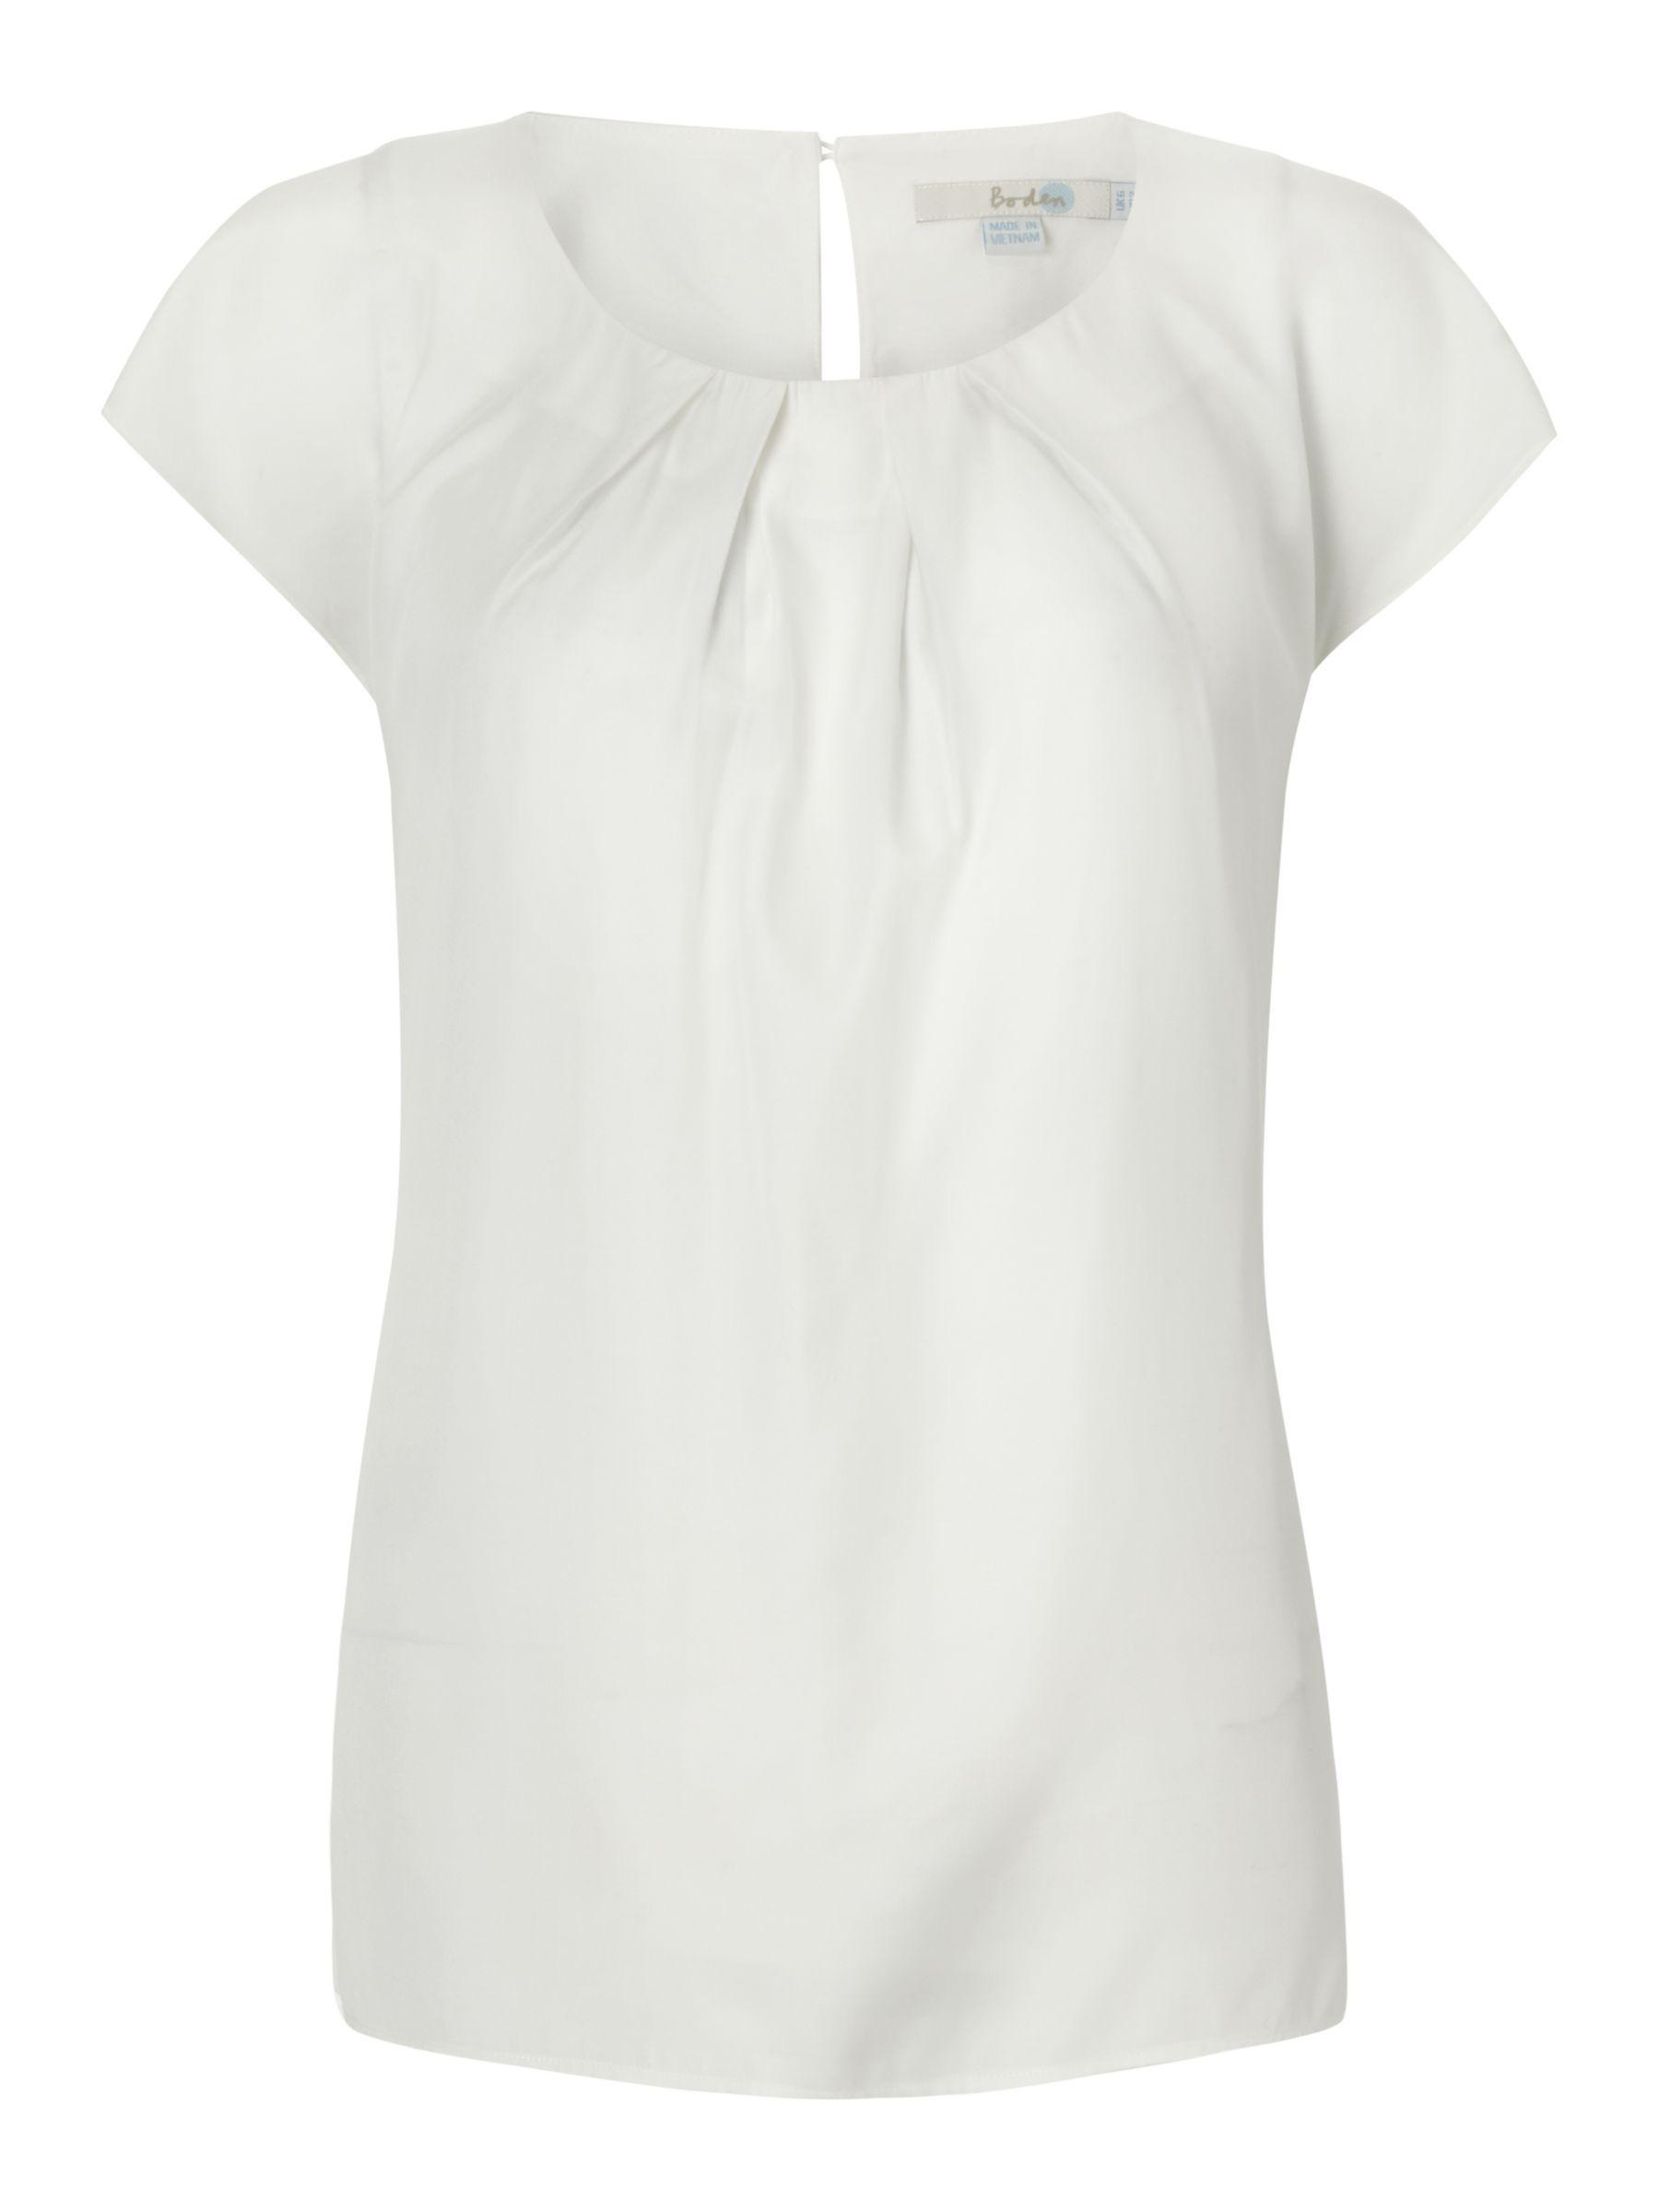 Boden Ravello Silk Blend Top | Boden, Tops, Fashion